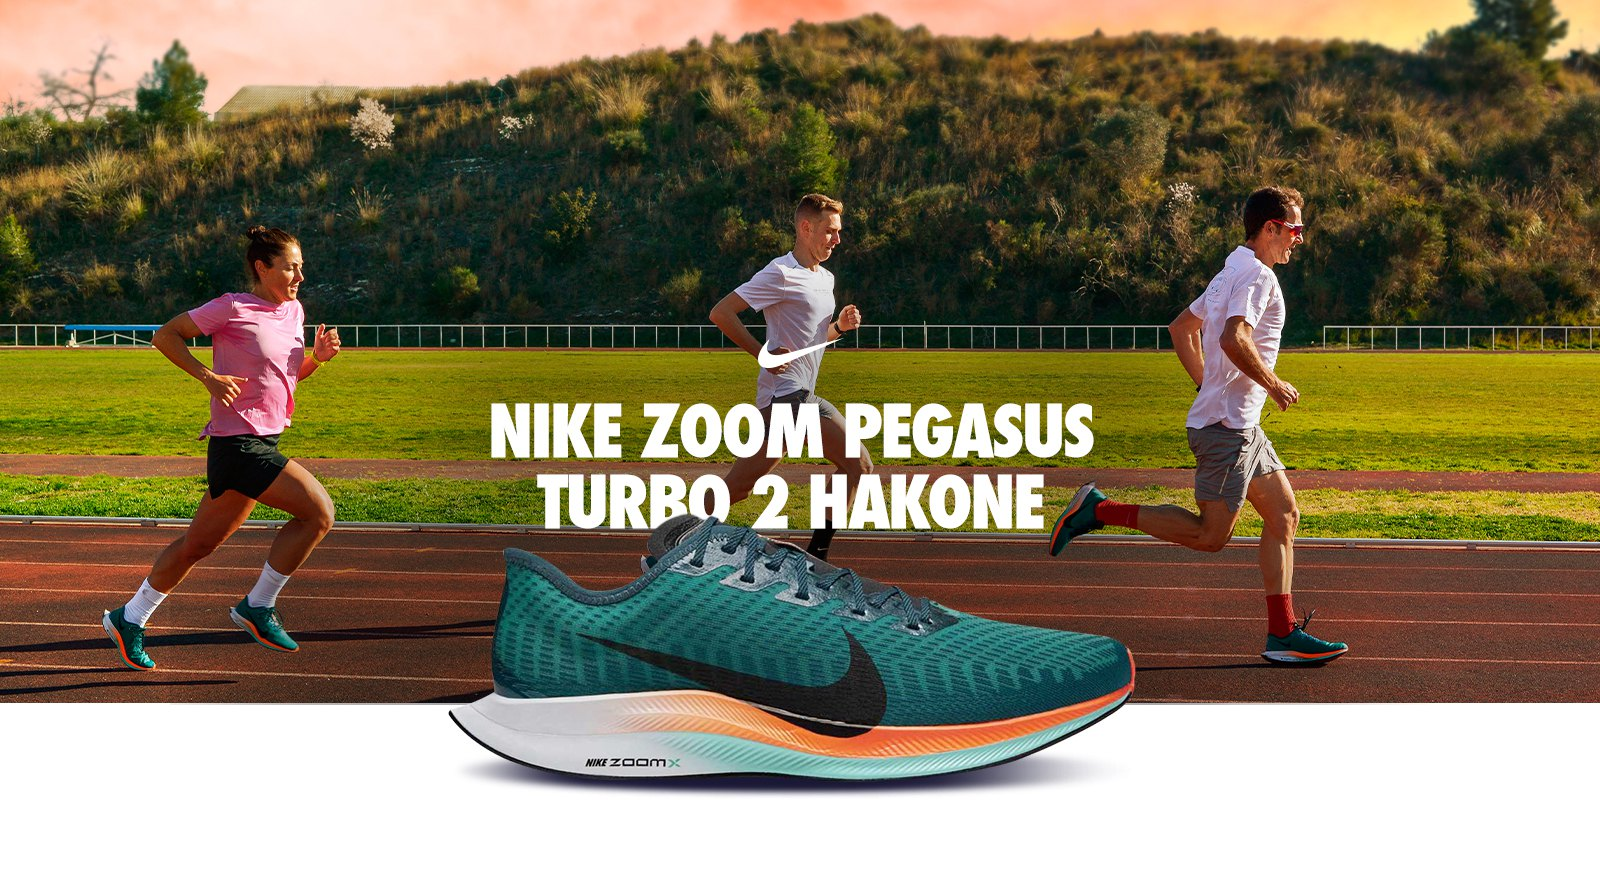 Nike Zoom Pegasus turbo 2 Hakone